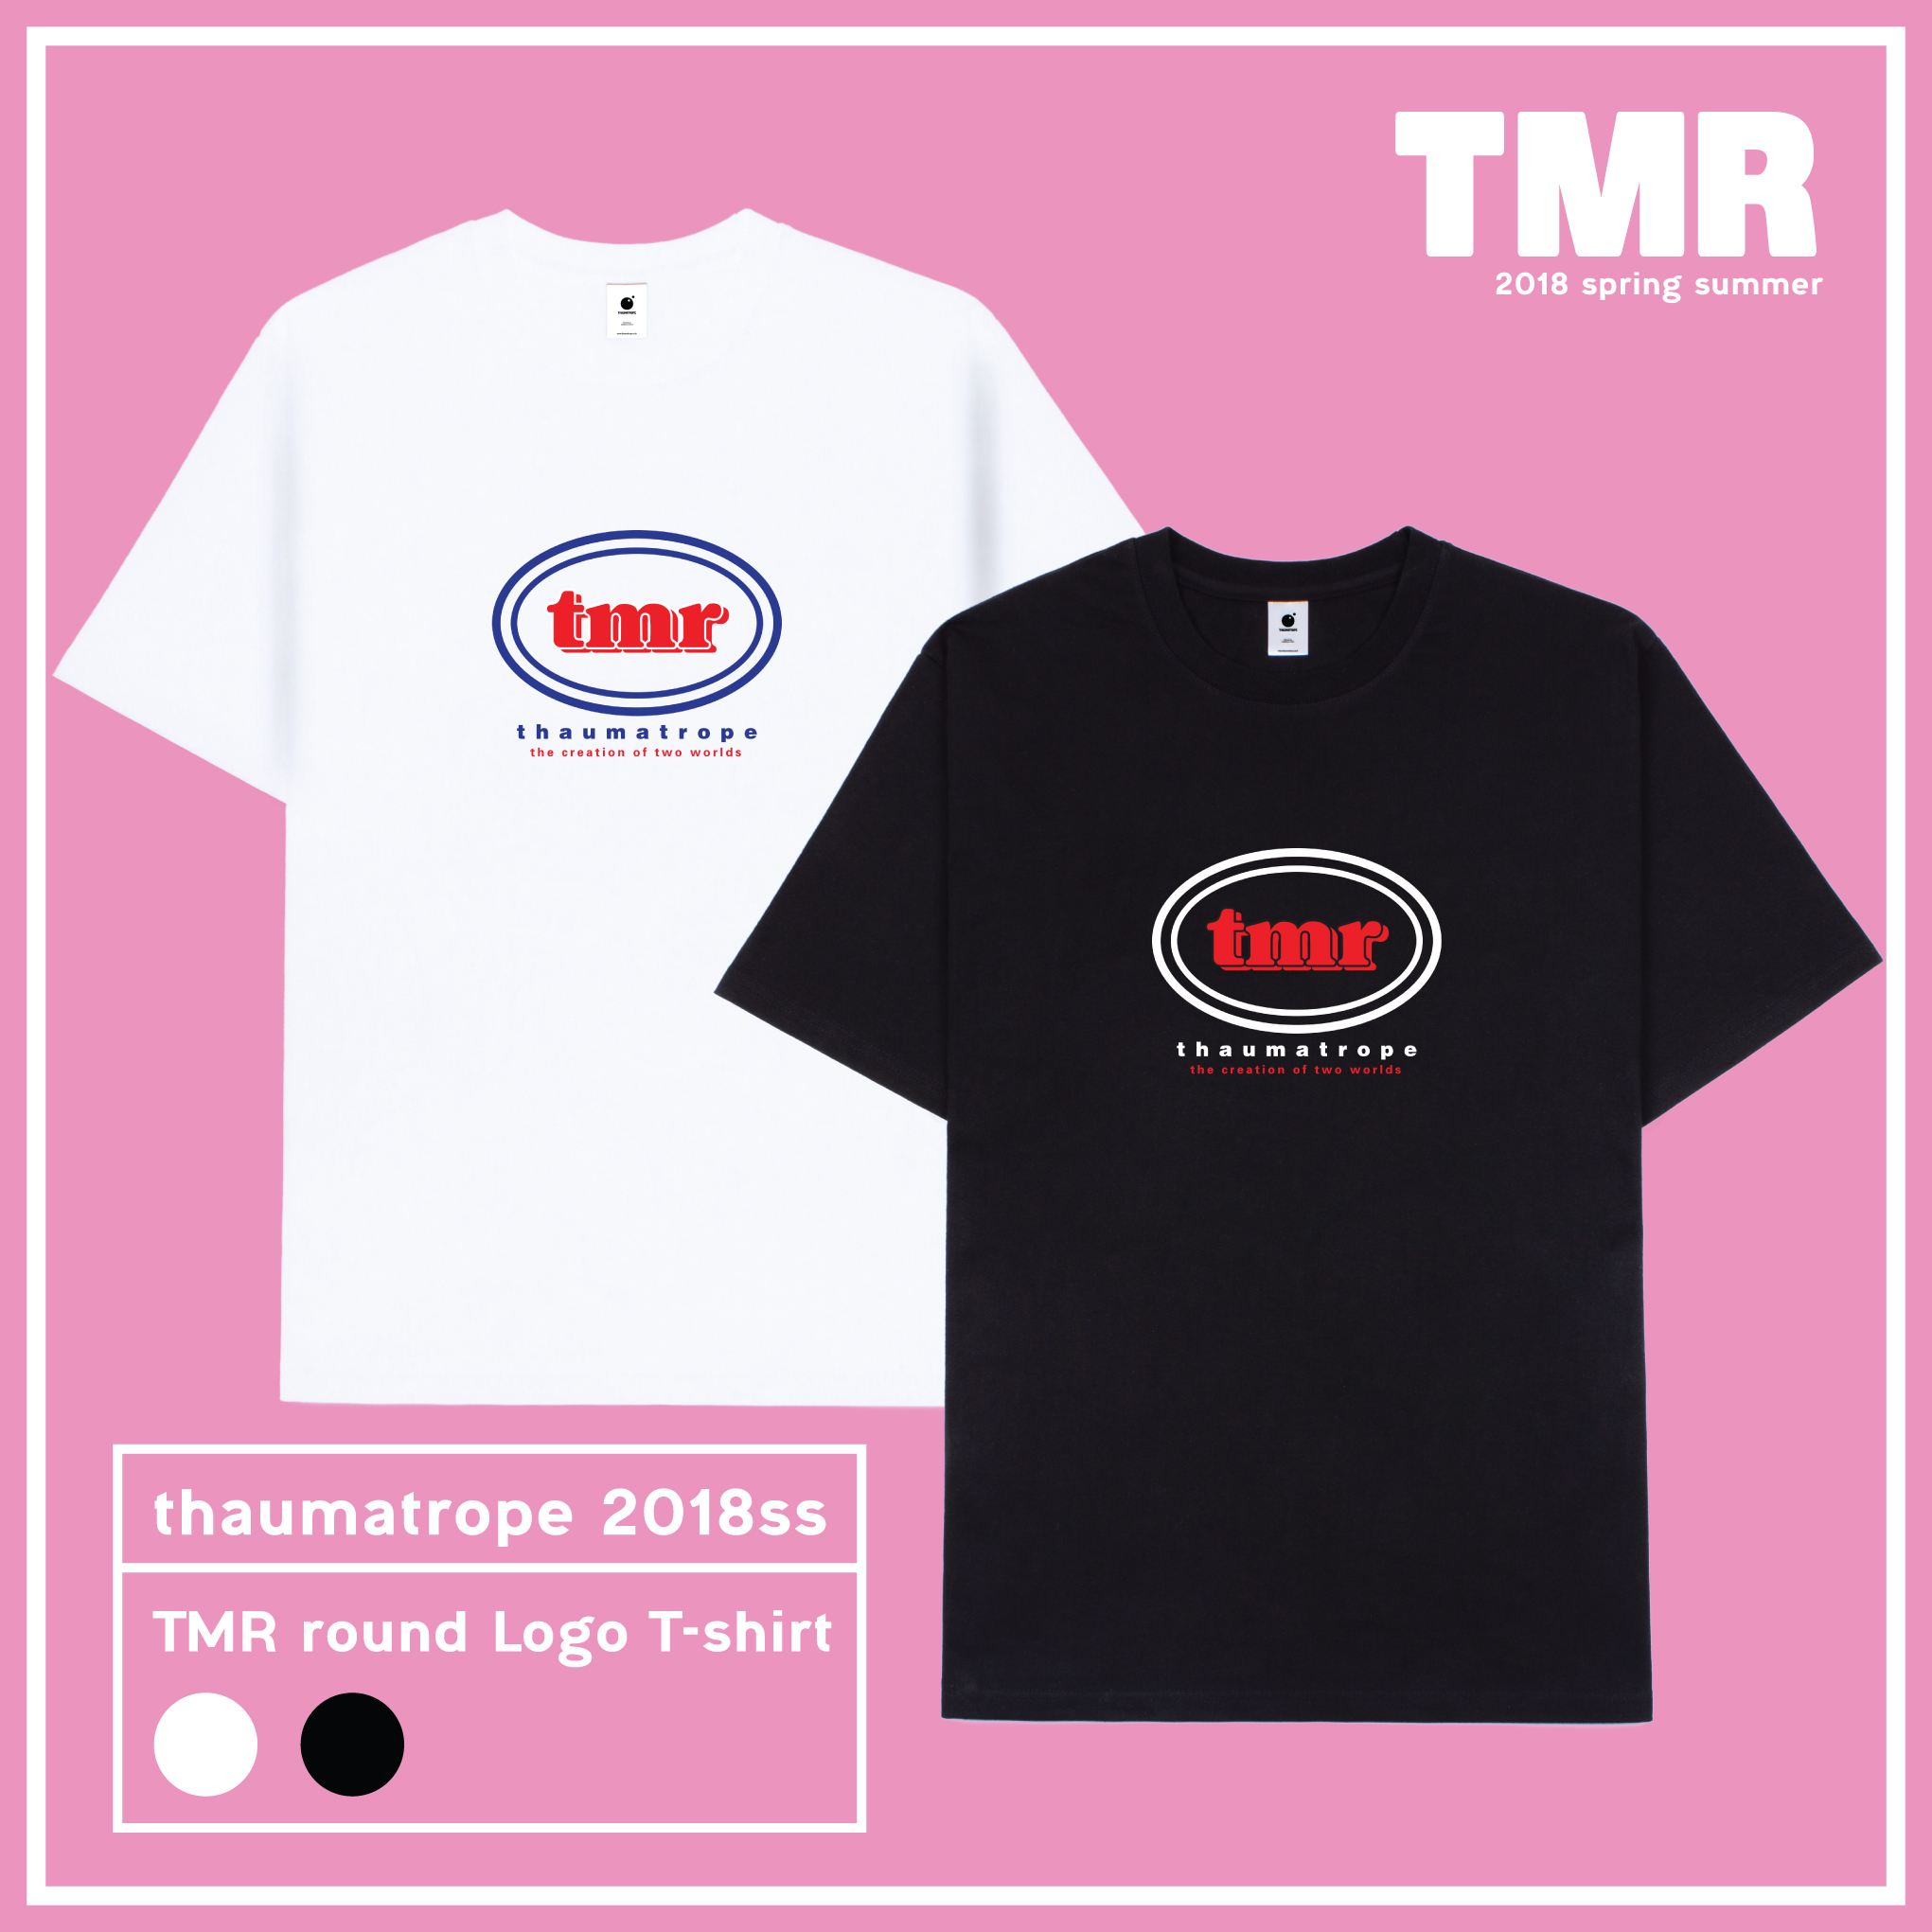 TMR ROUND LOGO T-SHIRTS